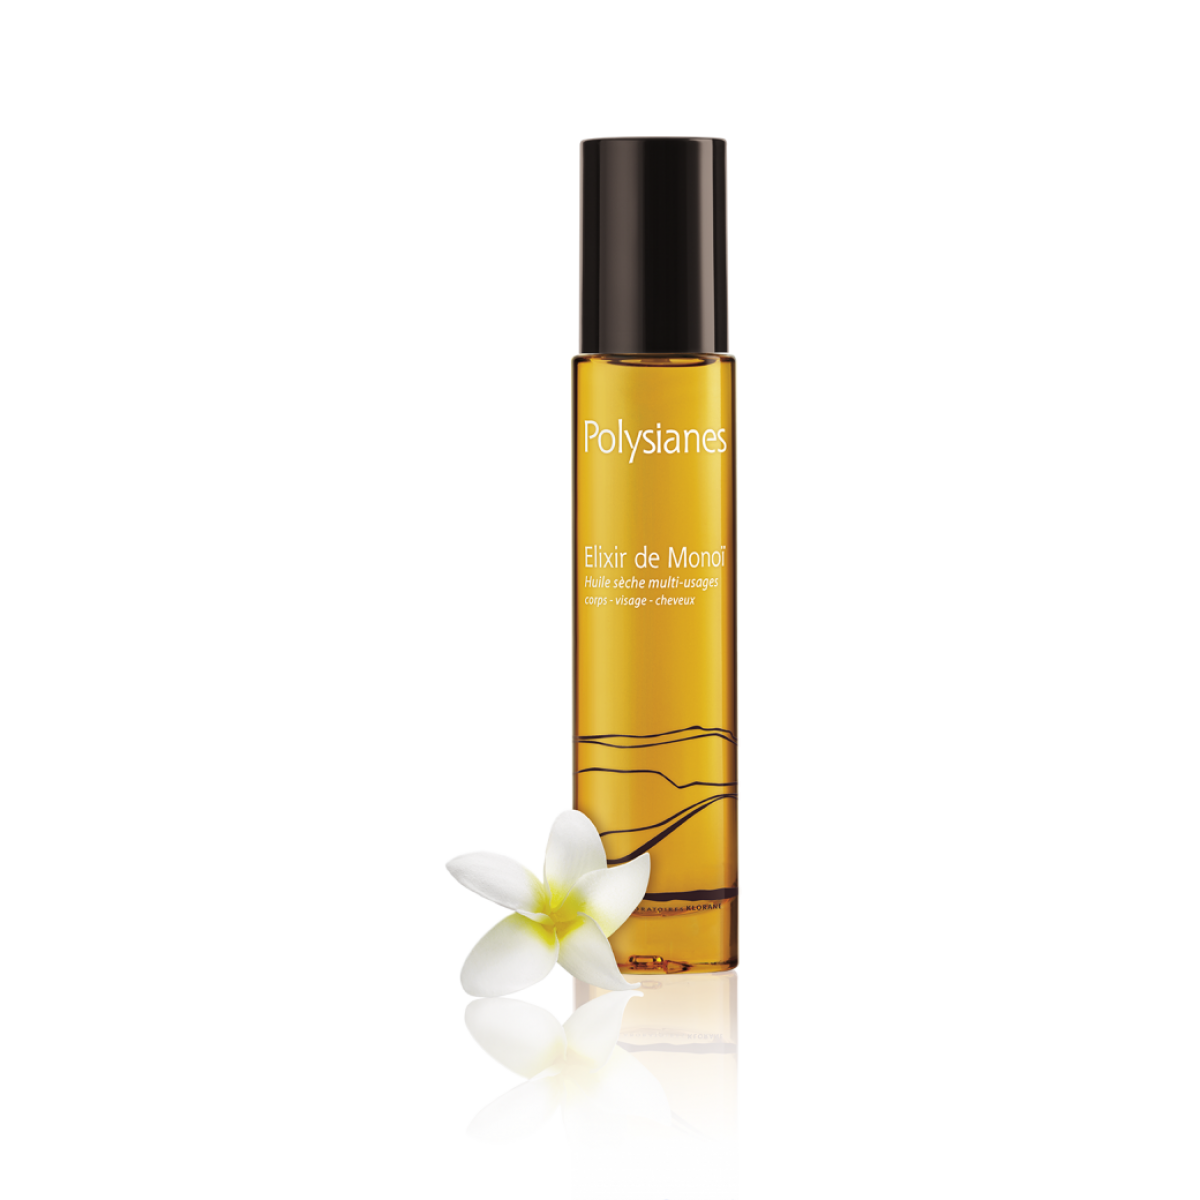 Polysianes Elixir de MonoiΞηρό Έλαιο Μονόι για Μαλλιά, Σώμα & Πρόσωπο, 100ml